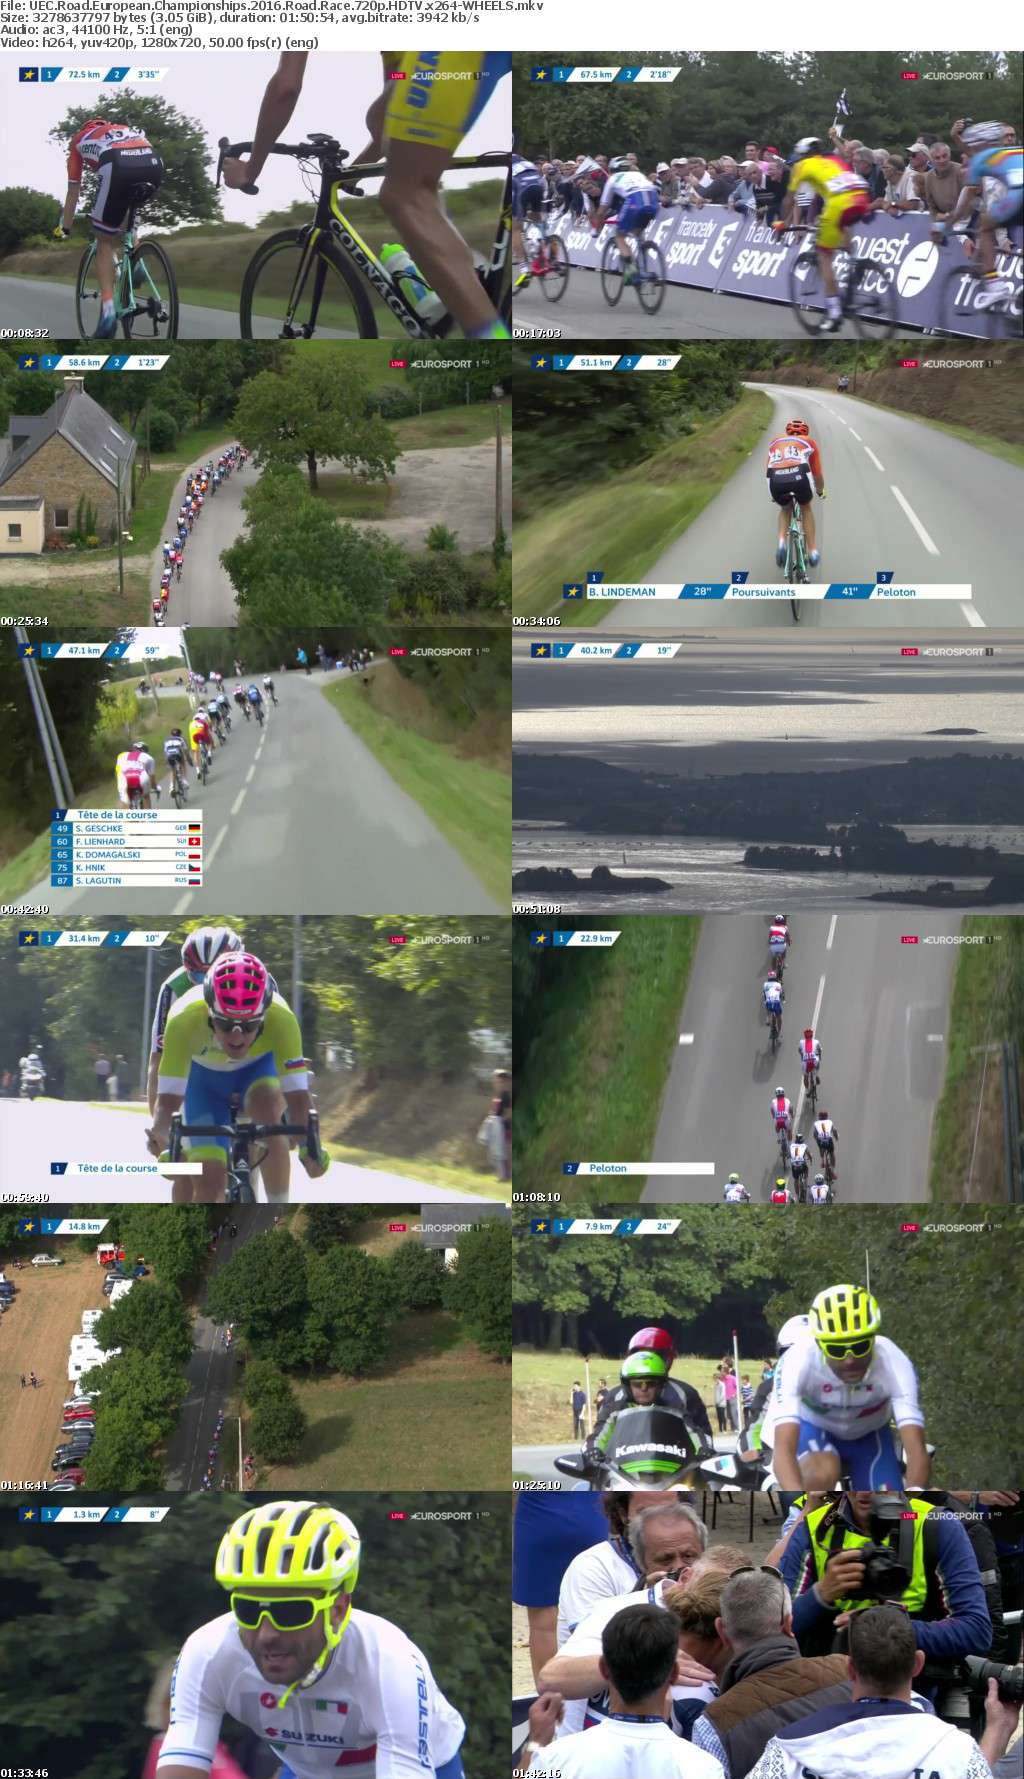 UEC Road European Championships 2016 Road Race 720p HDTV x264-WHEELS